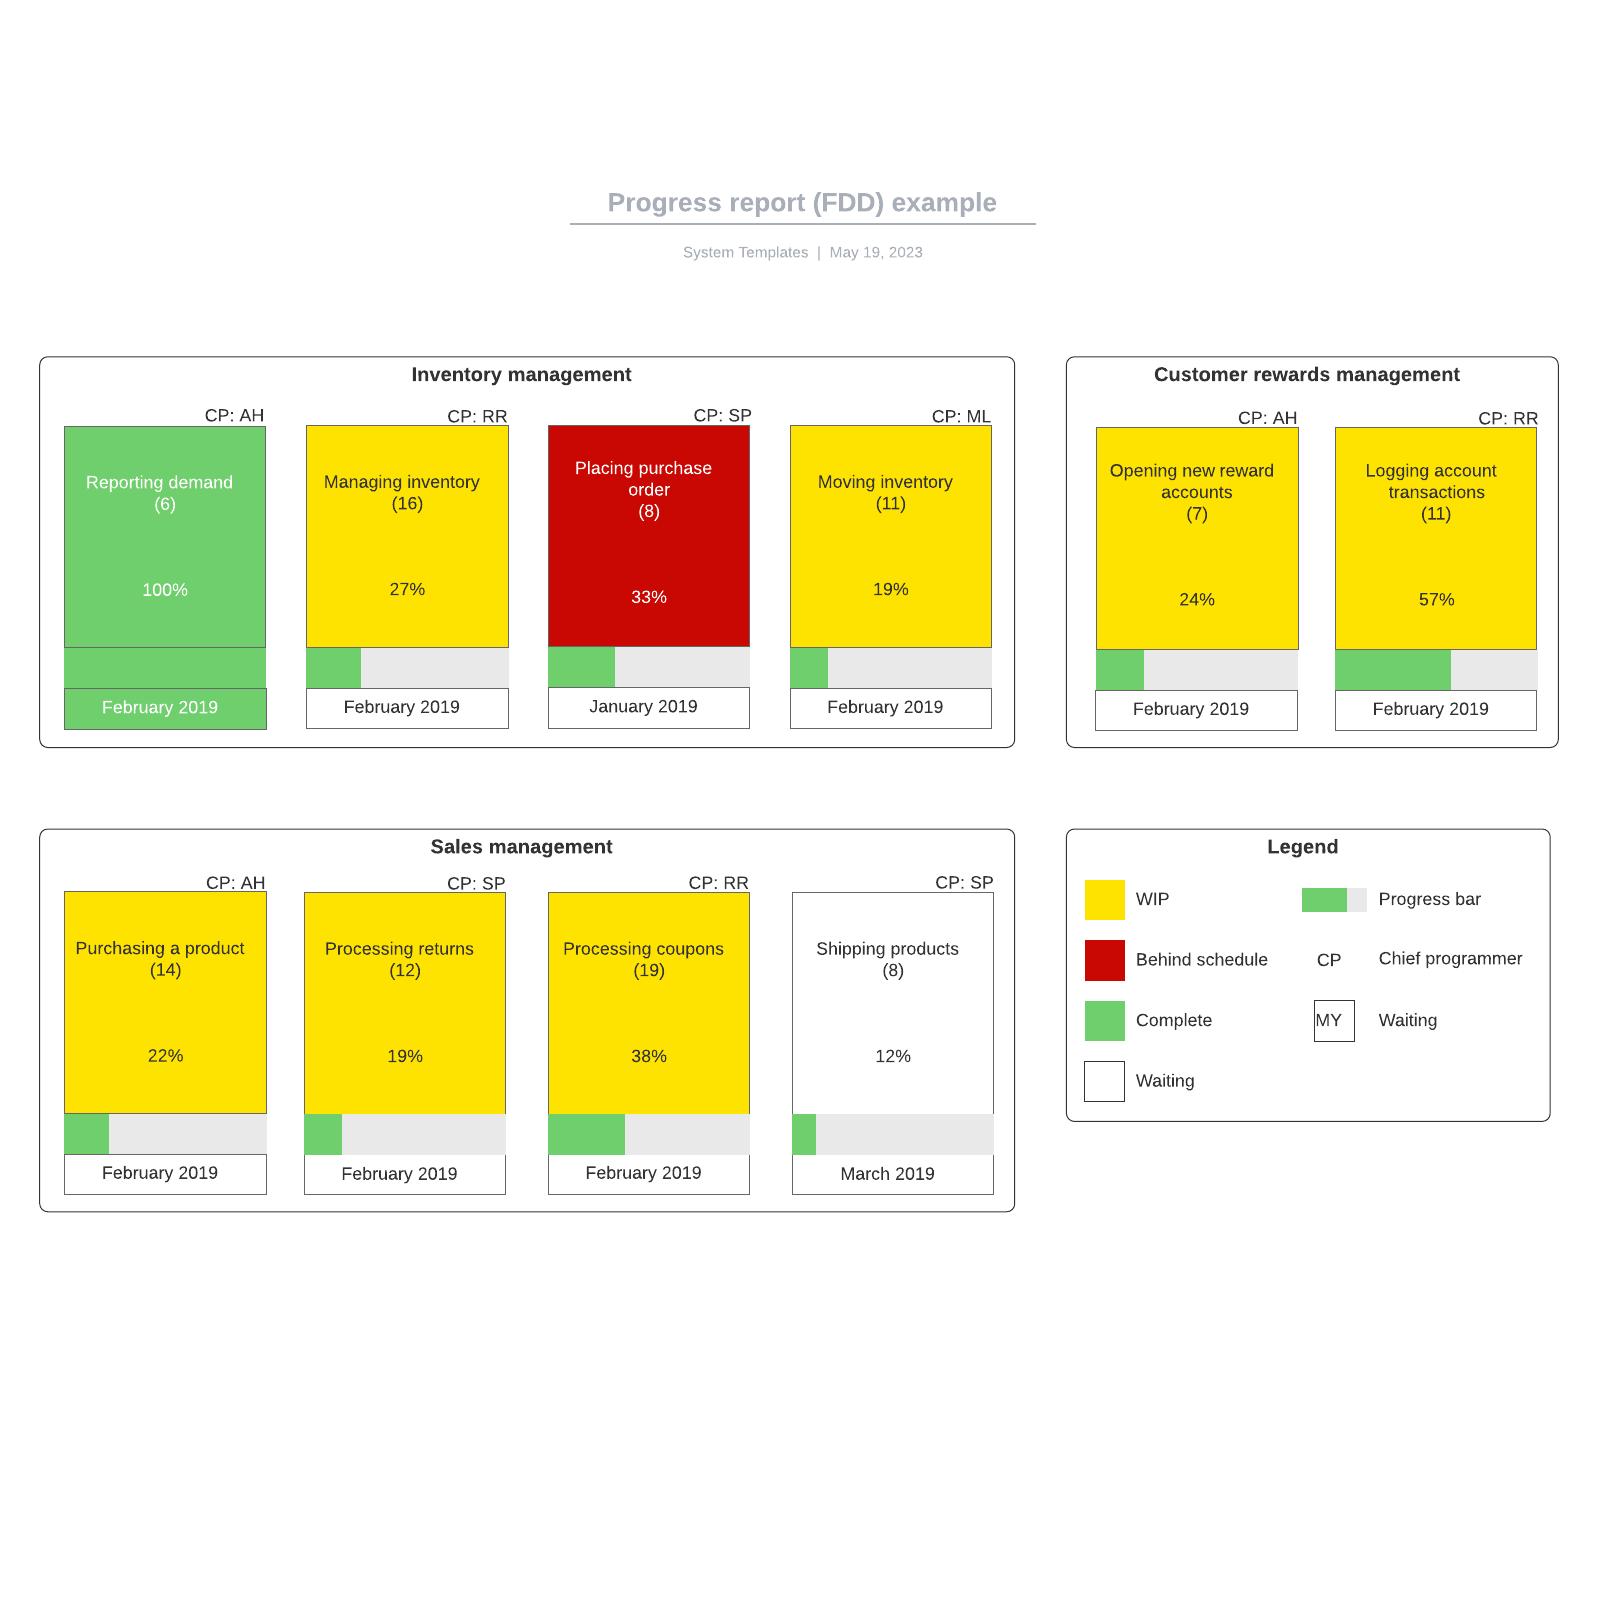 Progress report (FDD) example